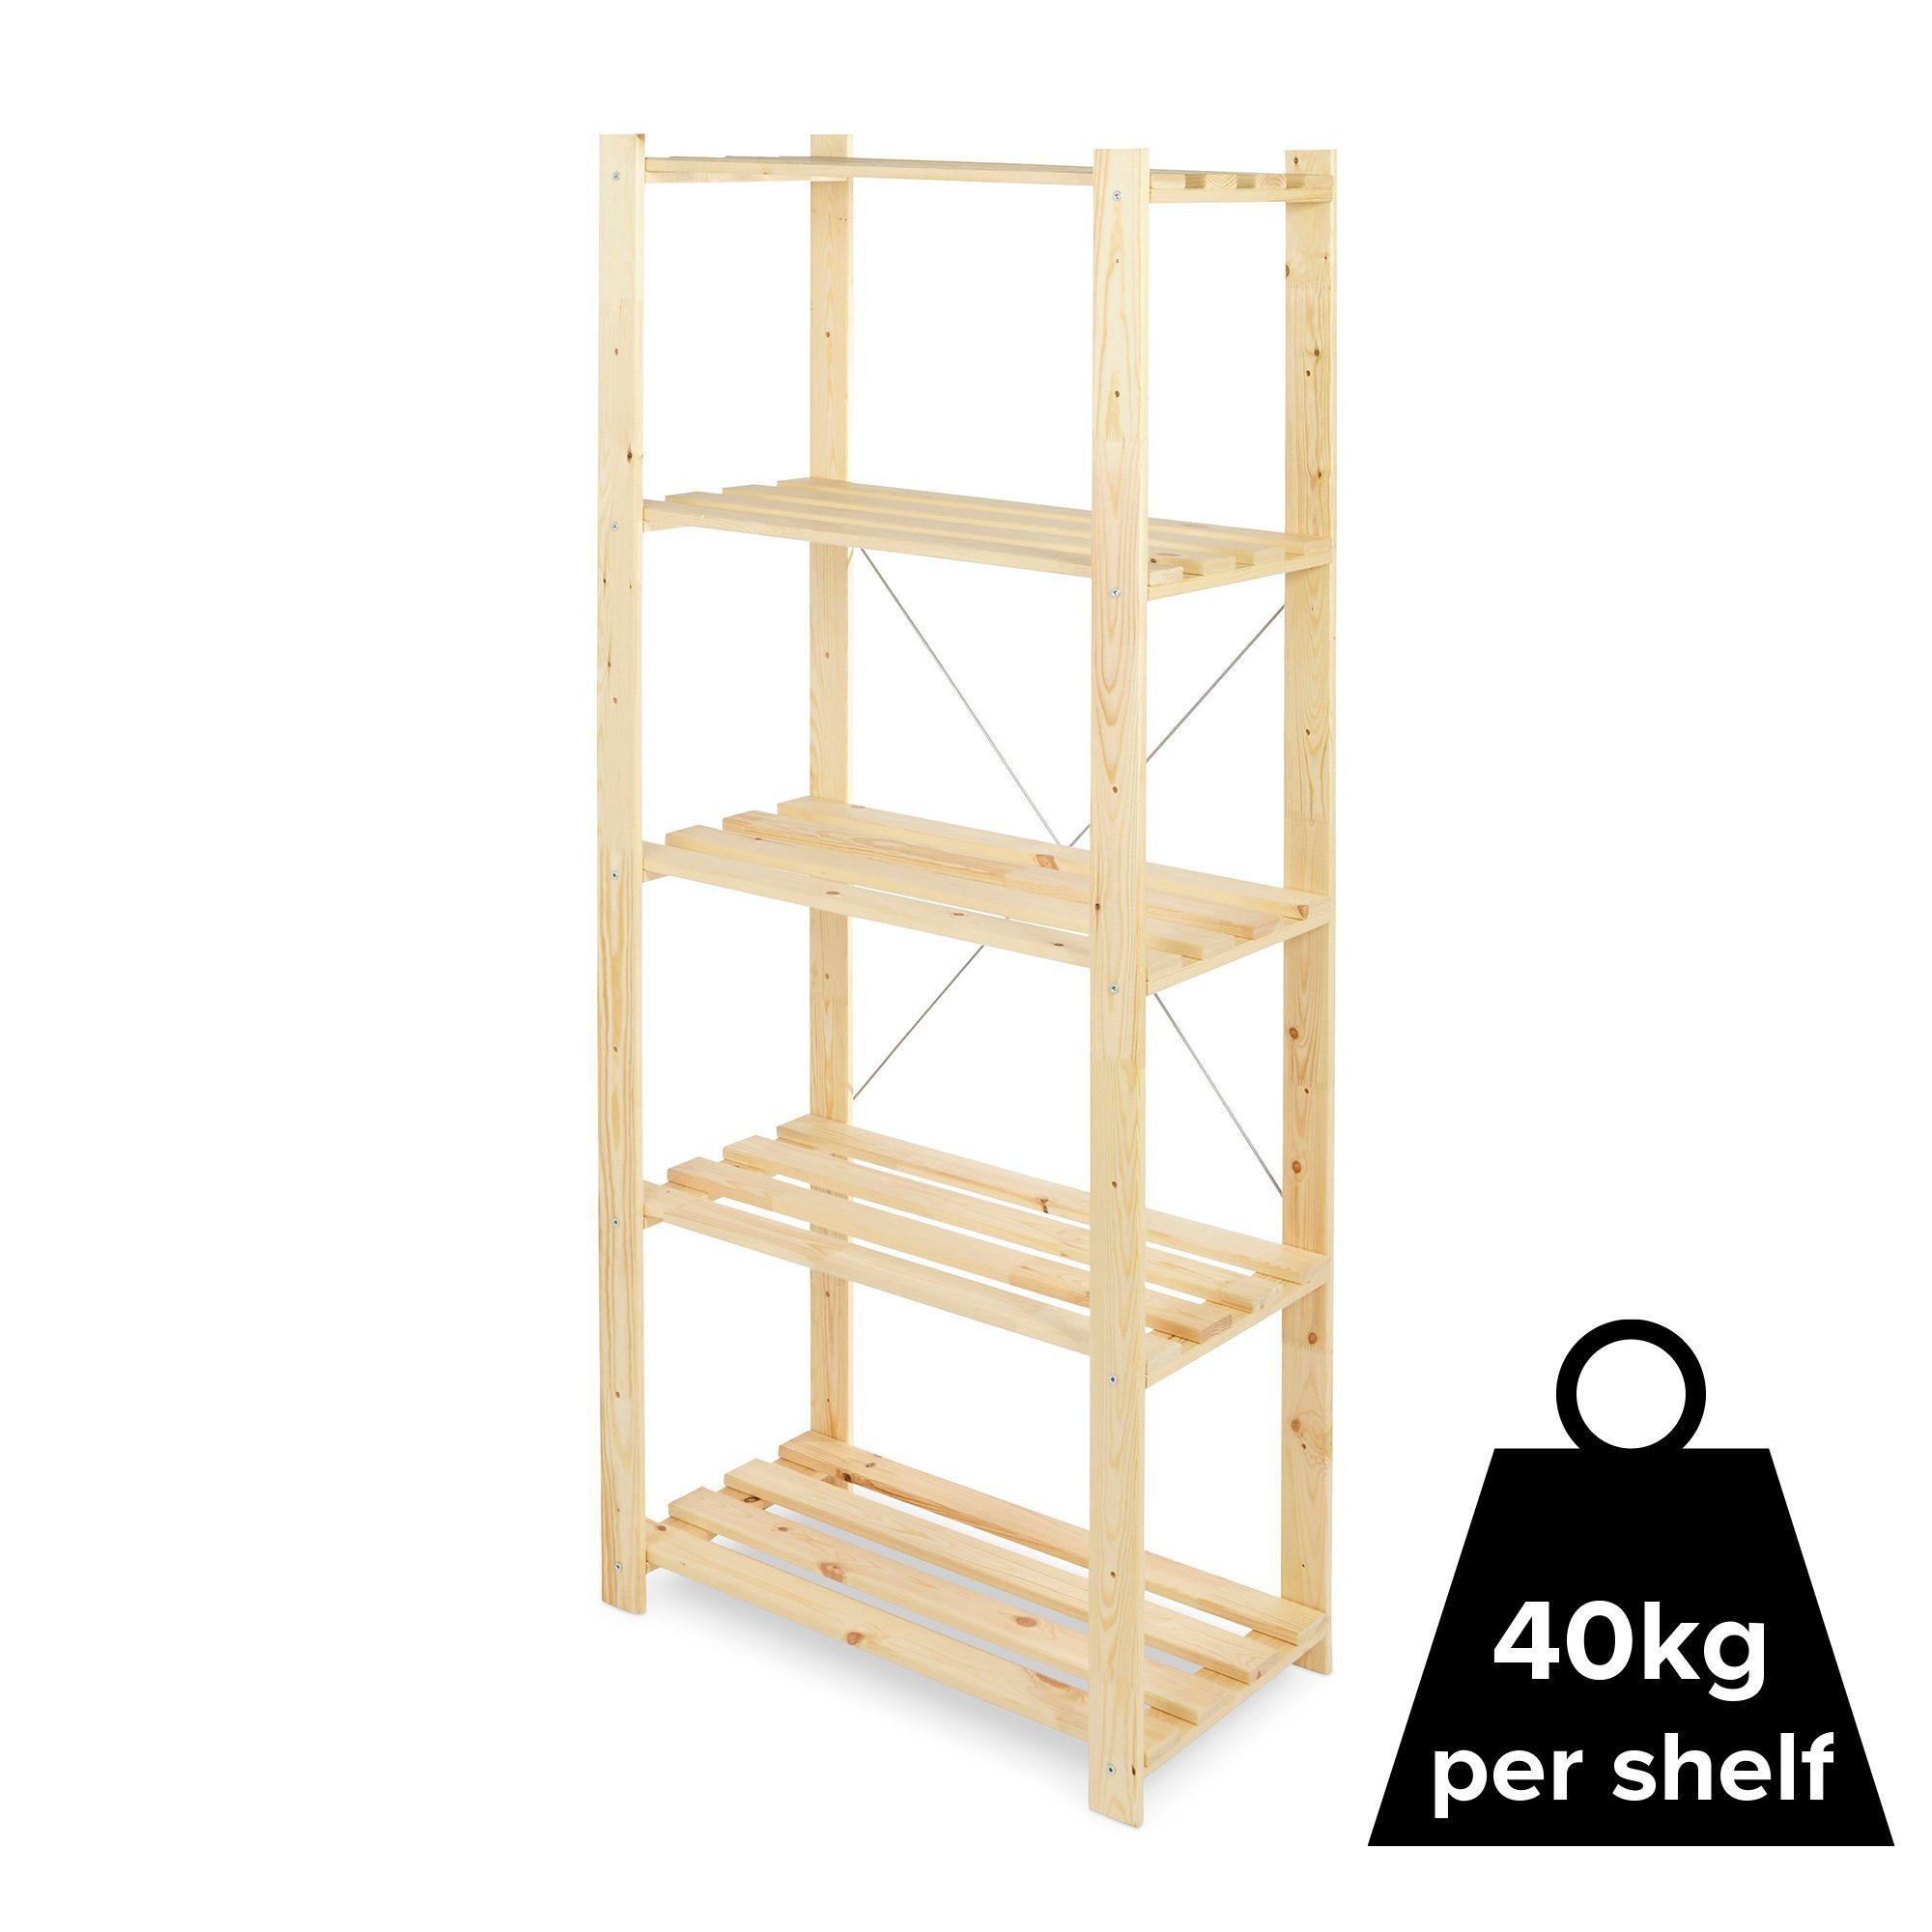 Diy Shelving Unit: Form Symbios 5 Shelf Wood Shelving Unit